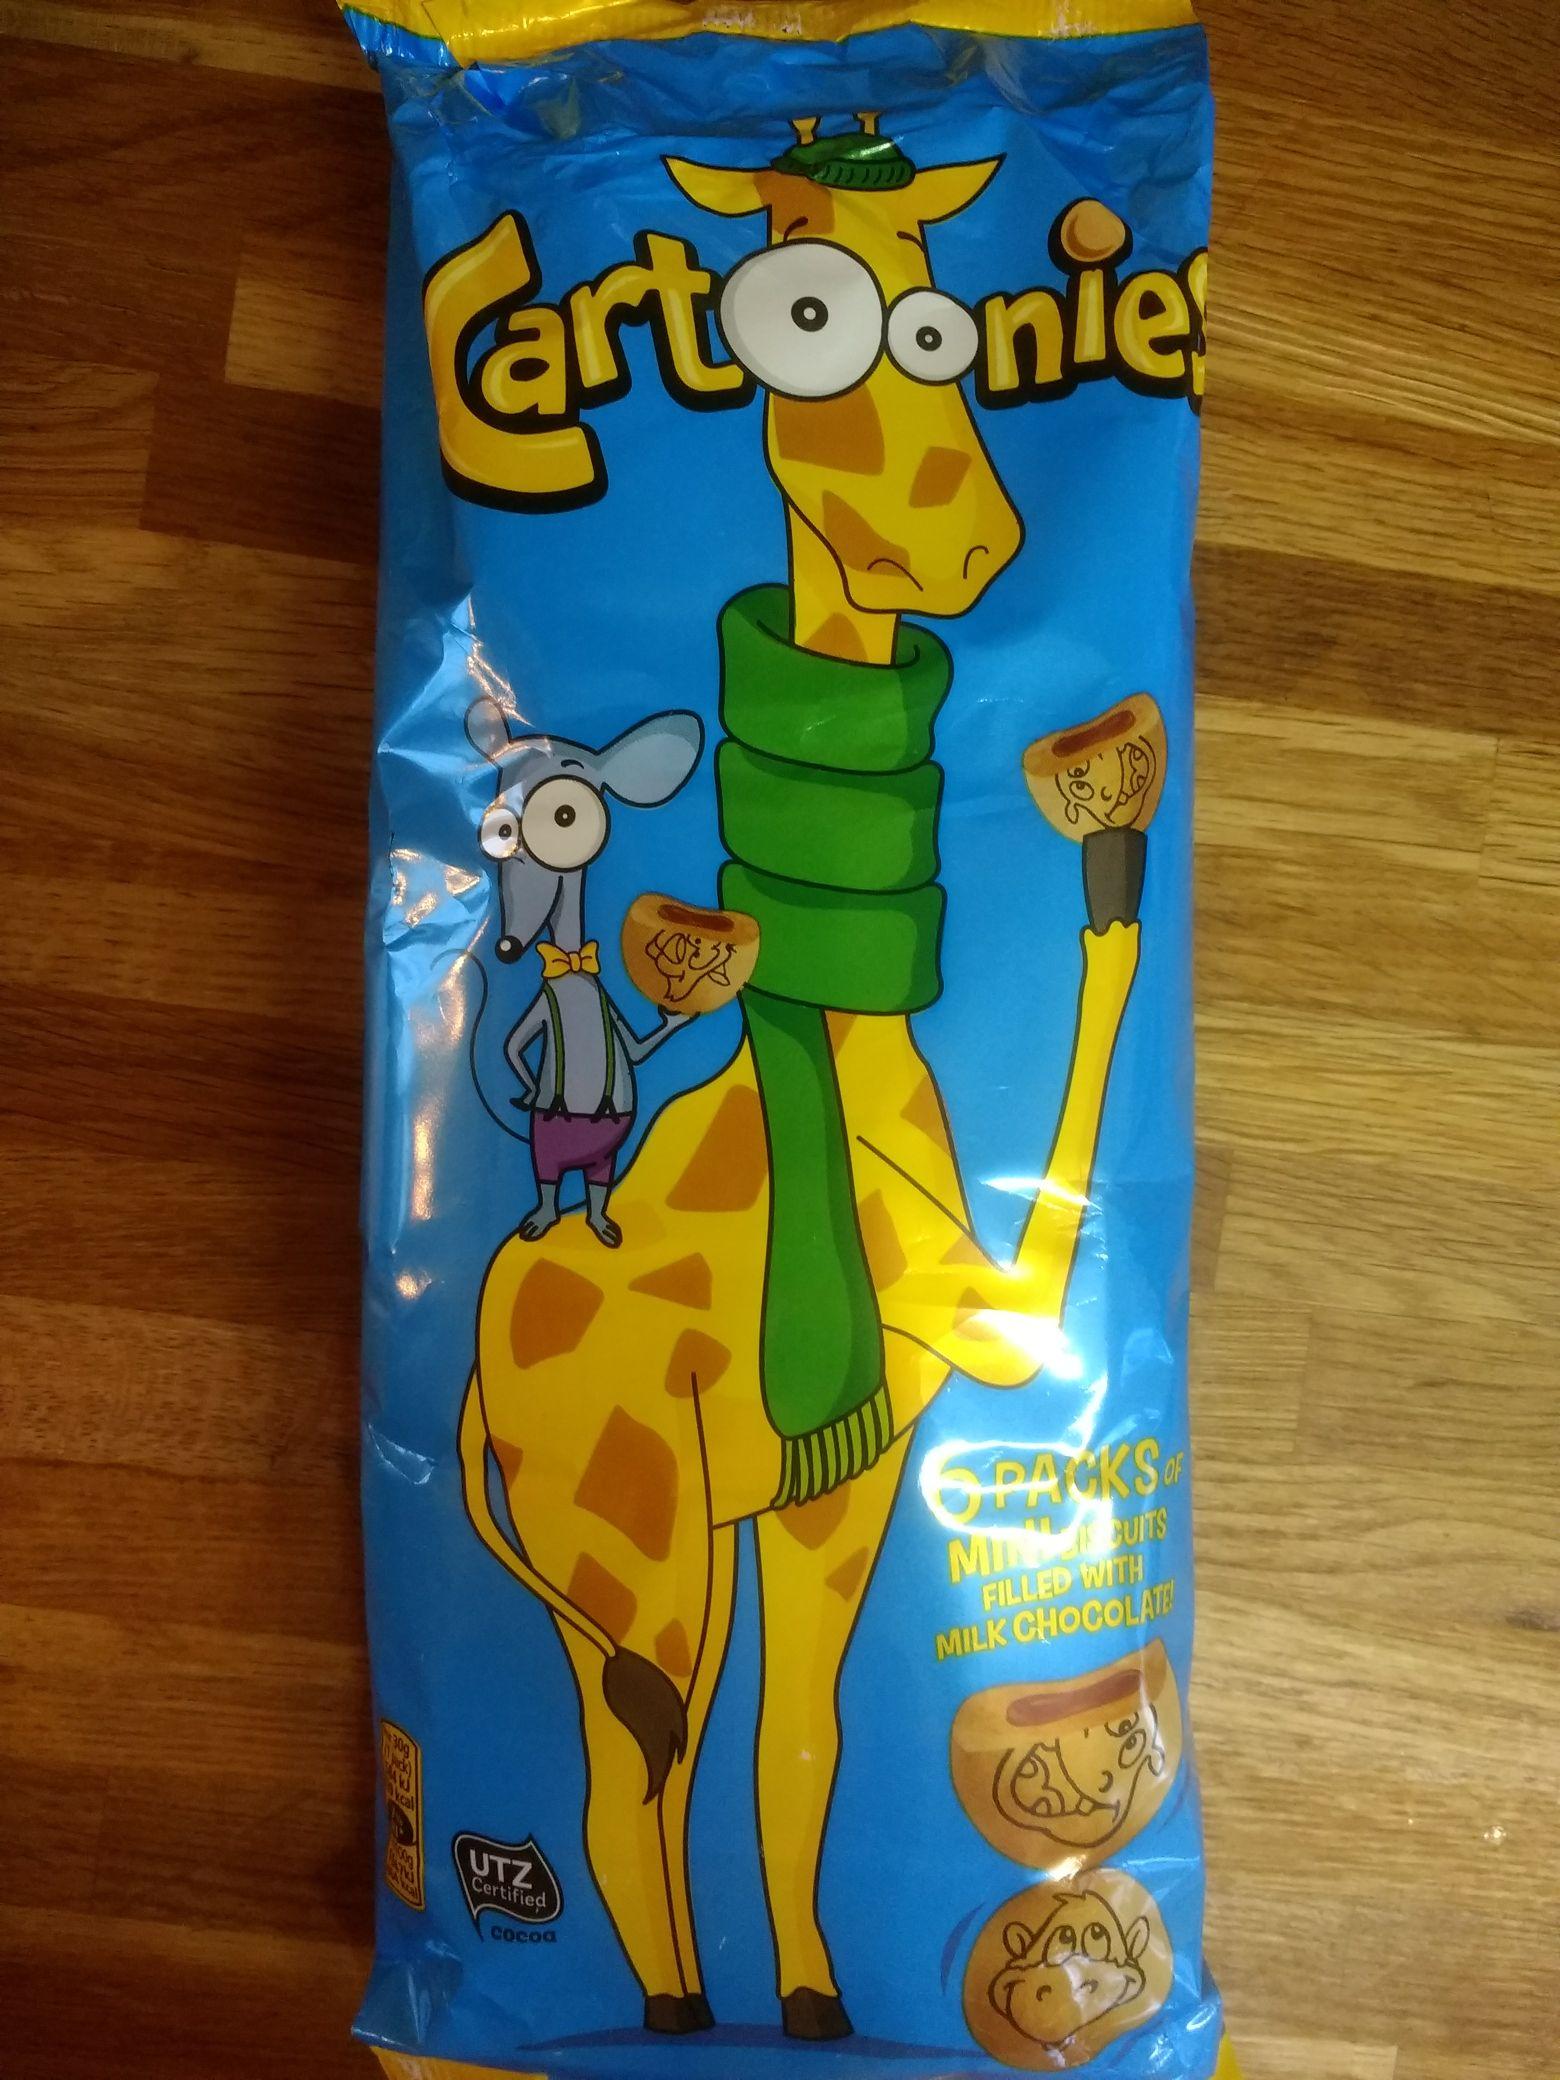 Cartoonies 89p in store Home Bargains